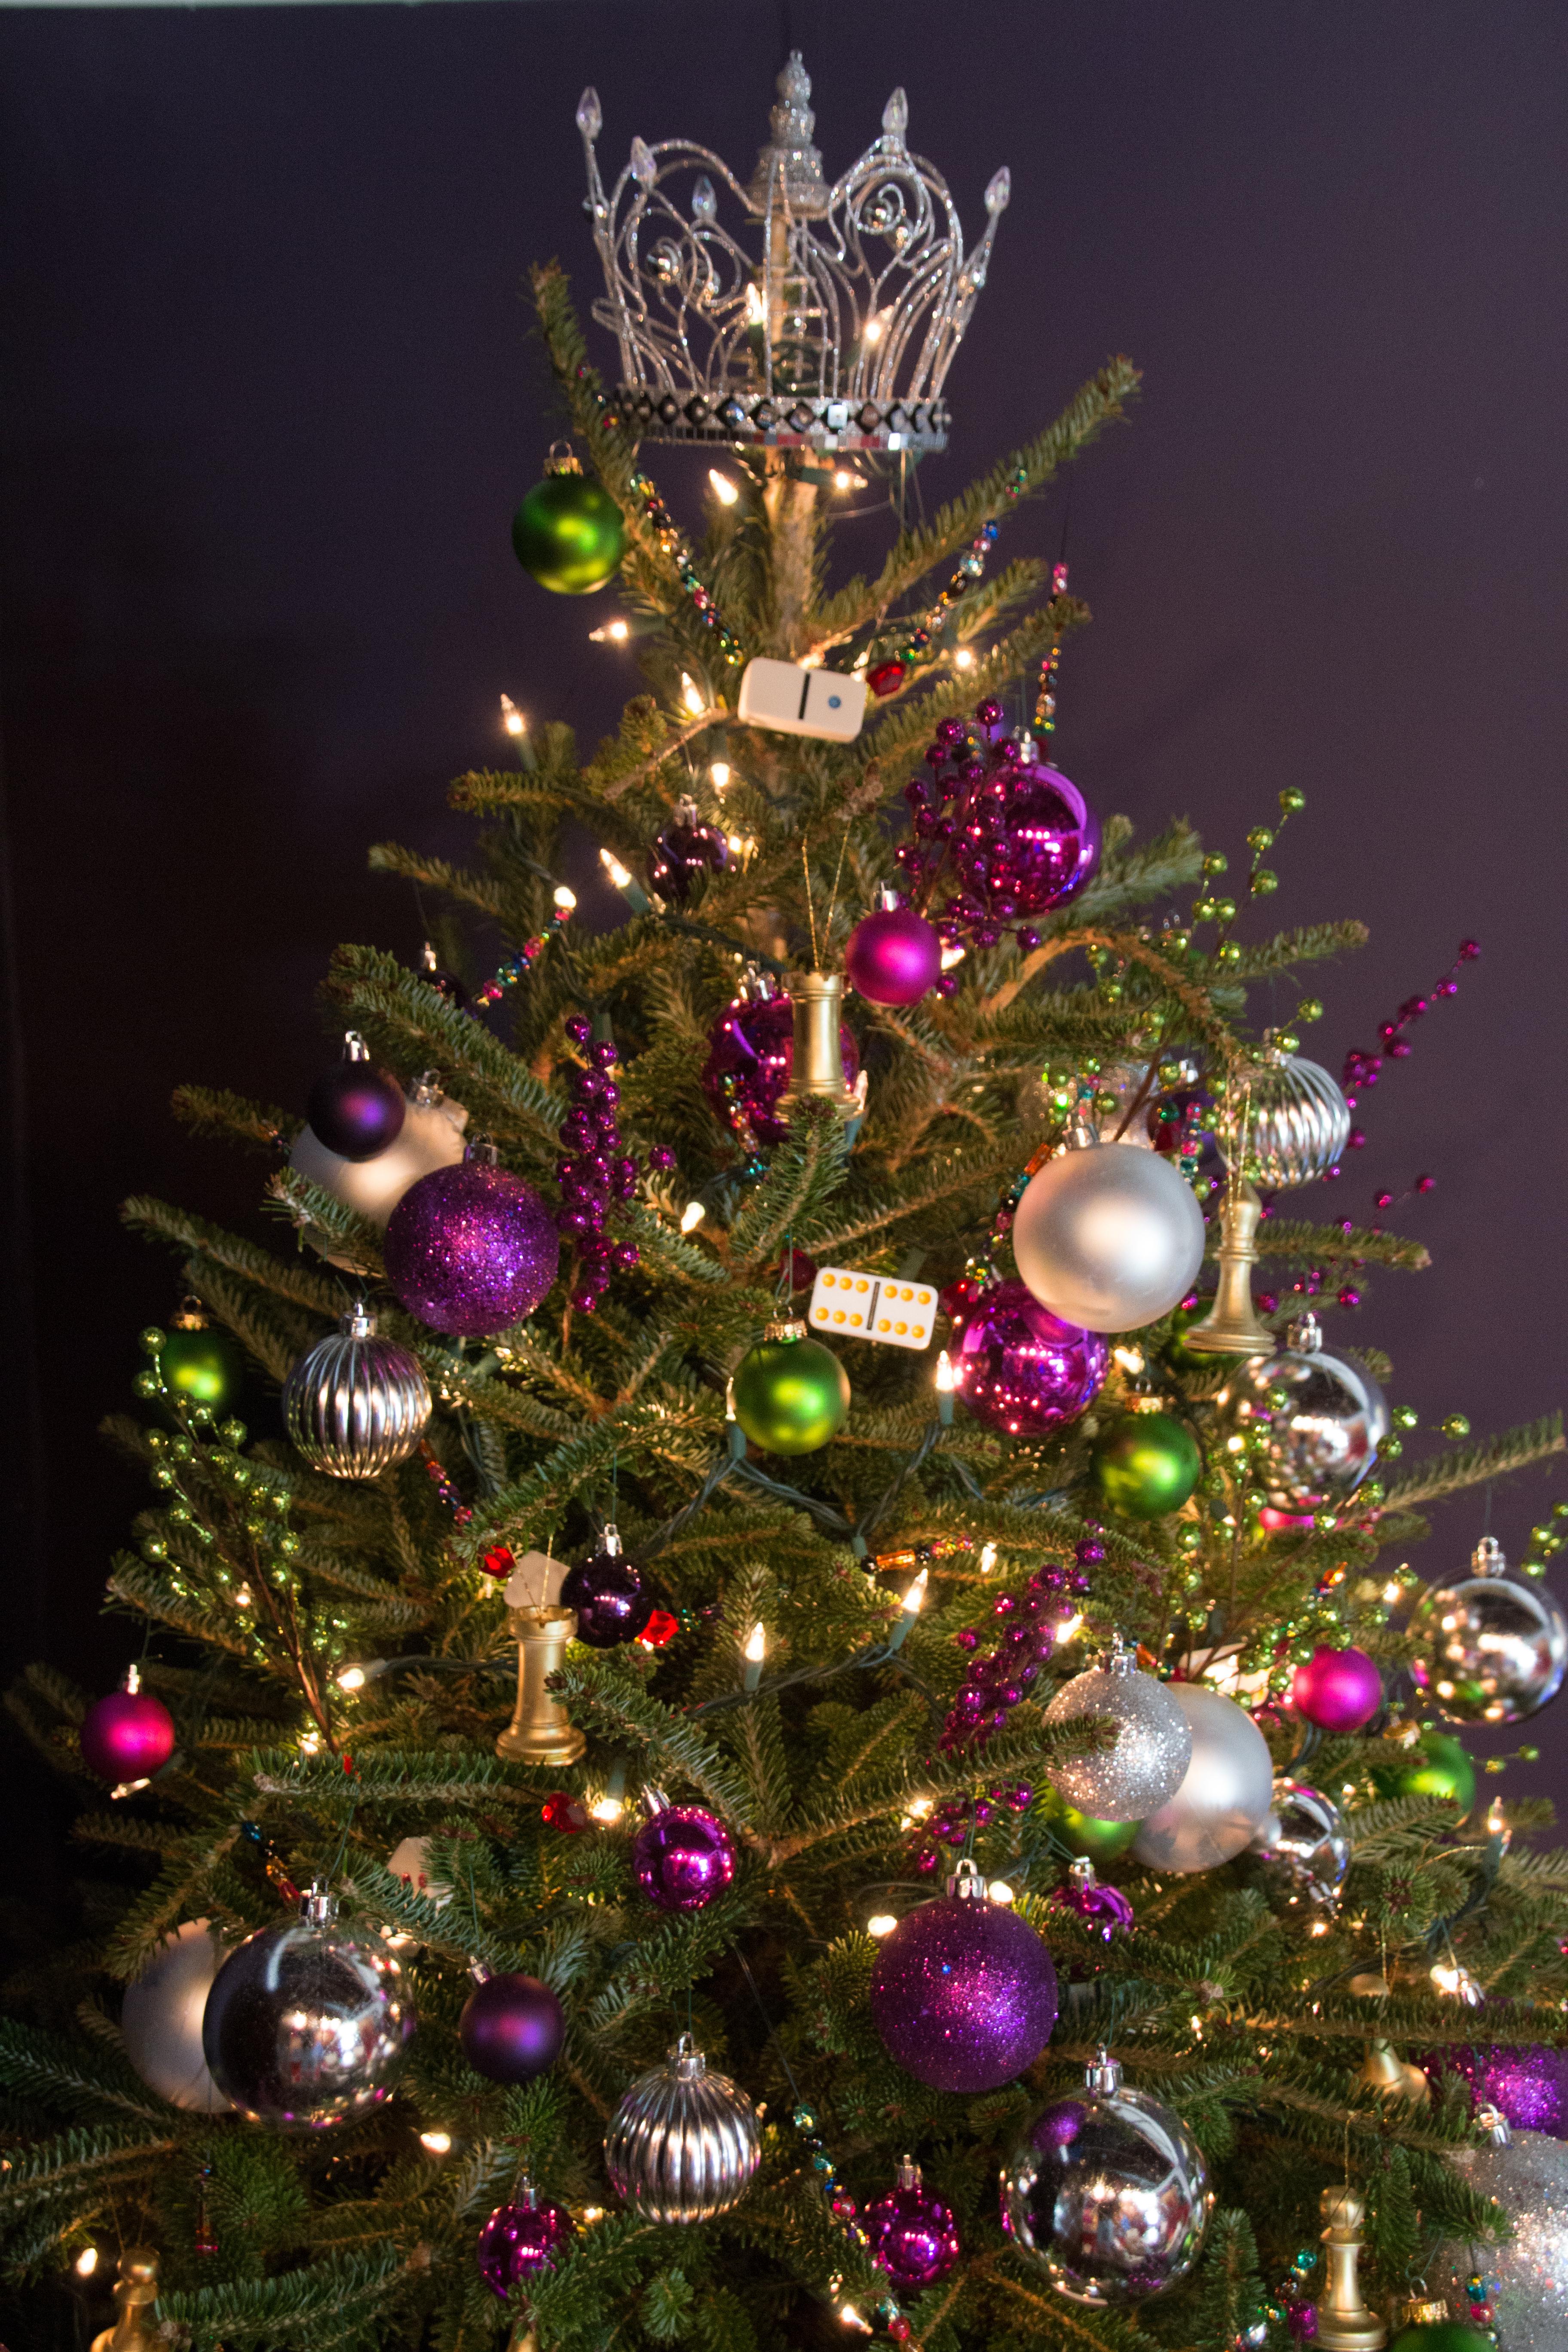 Southern Christmas ~ peeinn.com